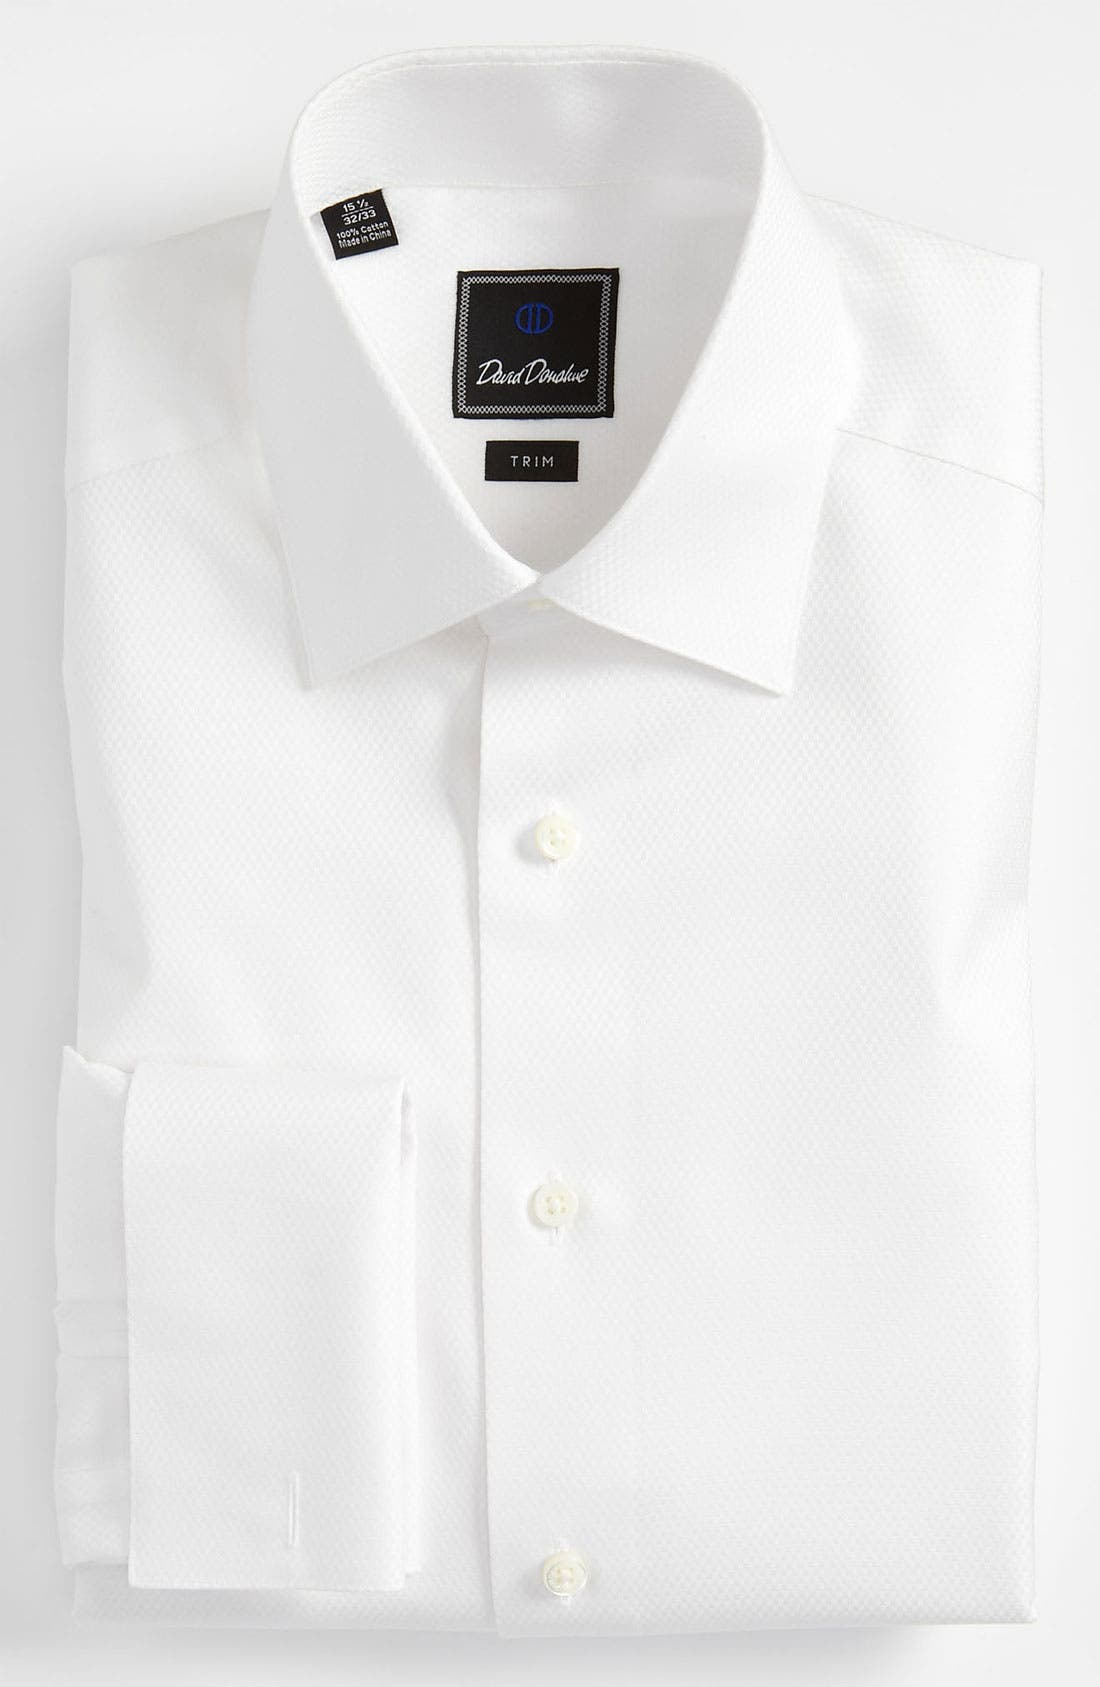 David Donahue Trim Fit Solid French Cuff Tuxedo Shirt